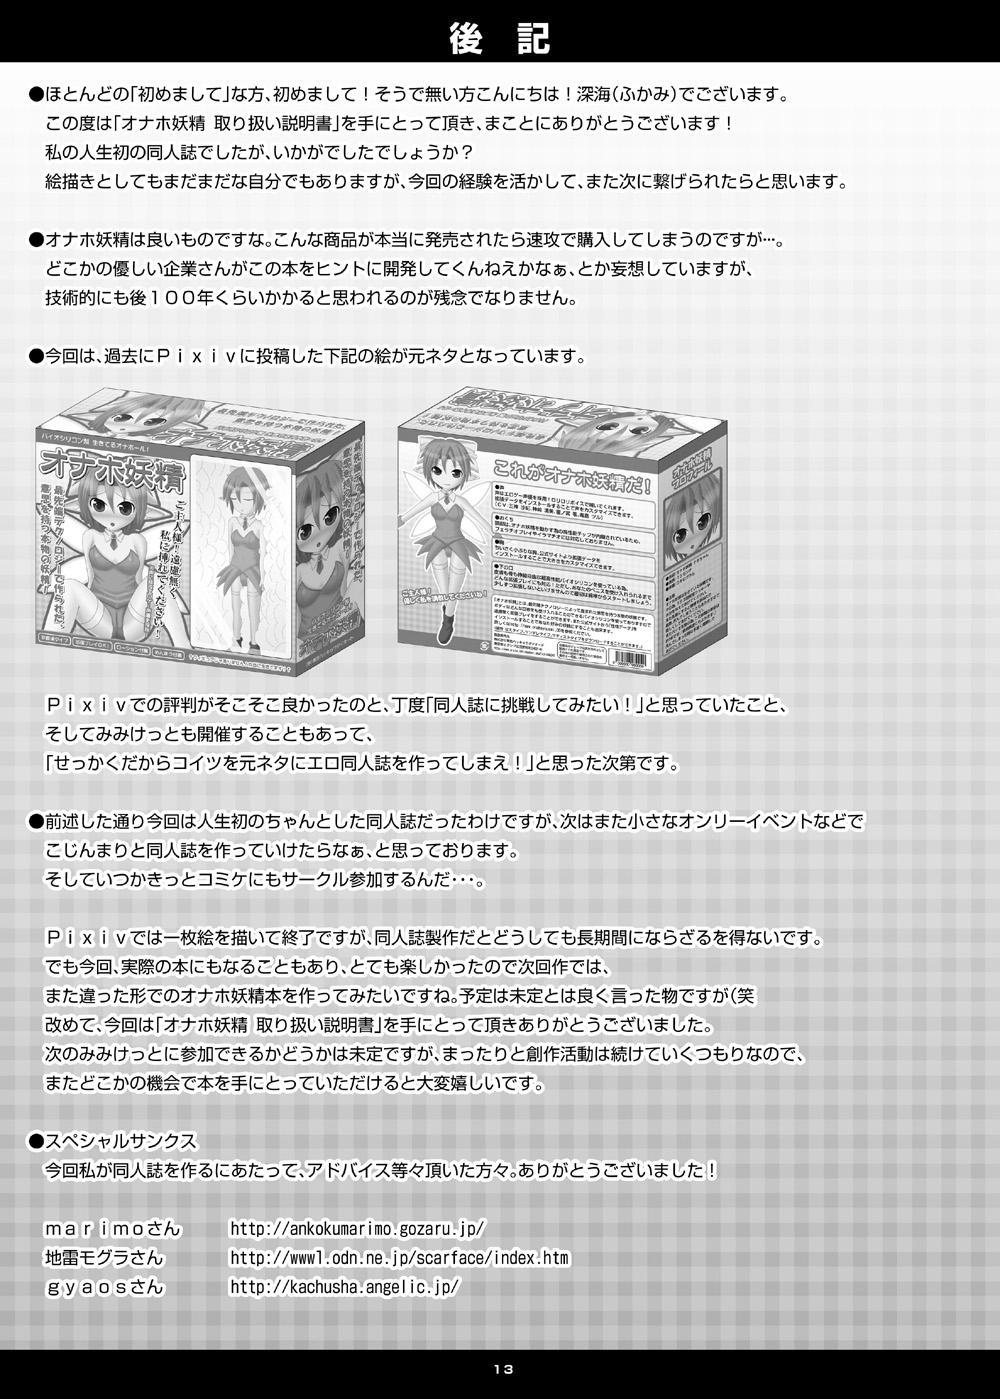 Onaho Yousei Toriatsukai Setsumei-sho 11